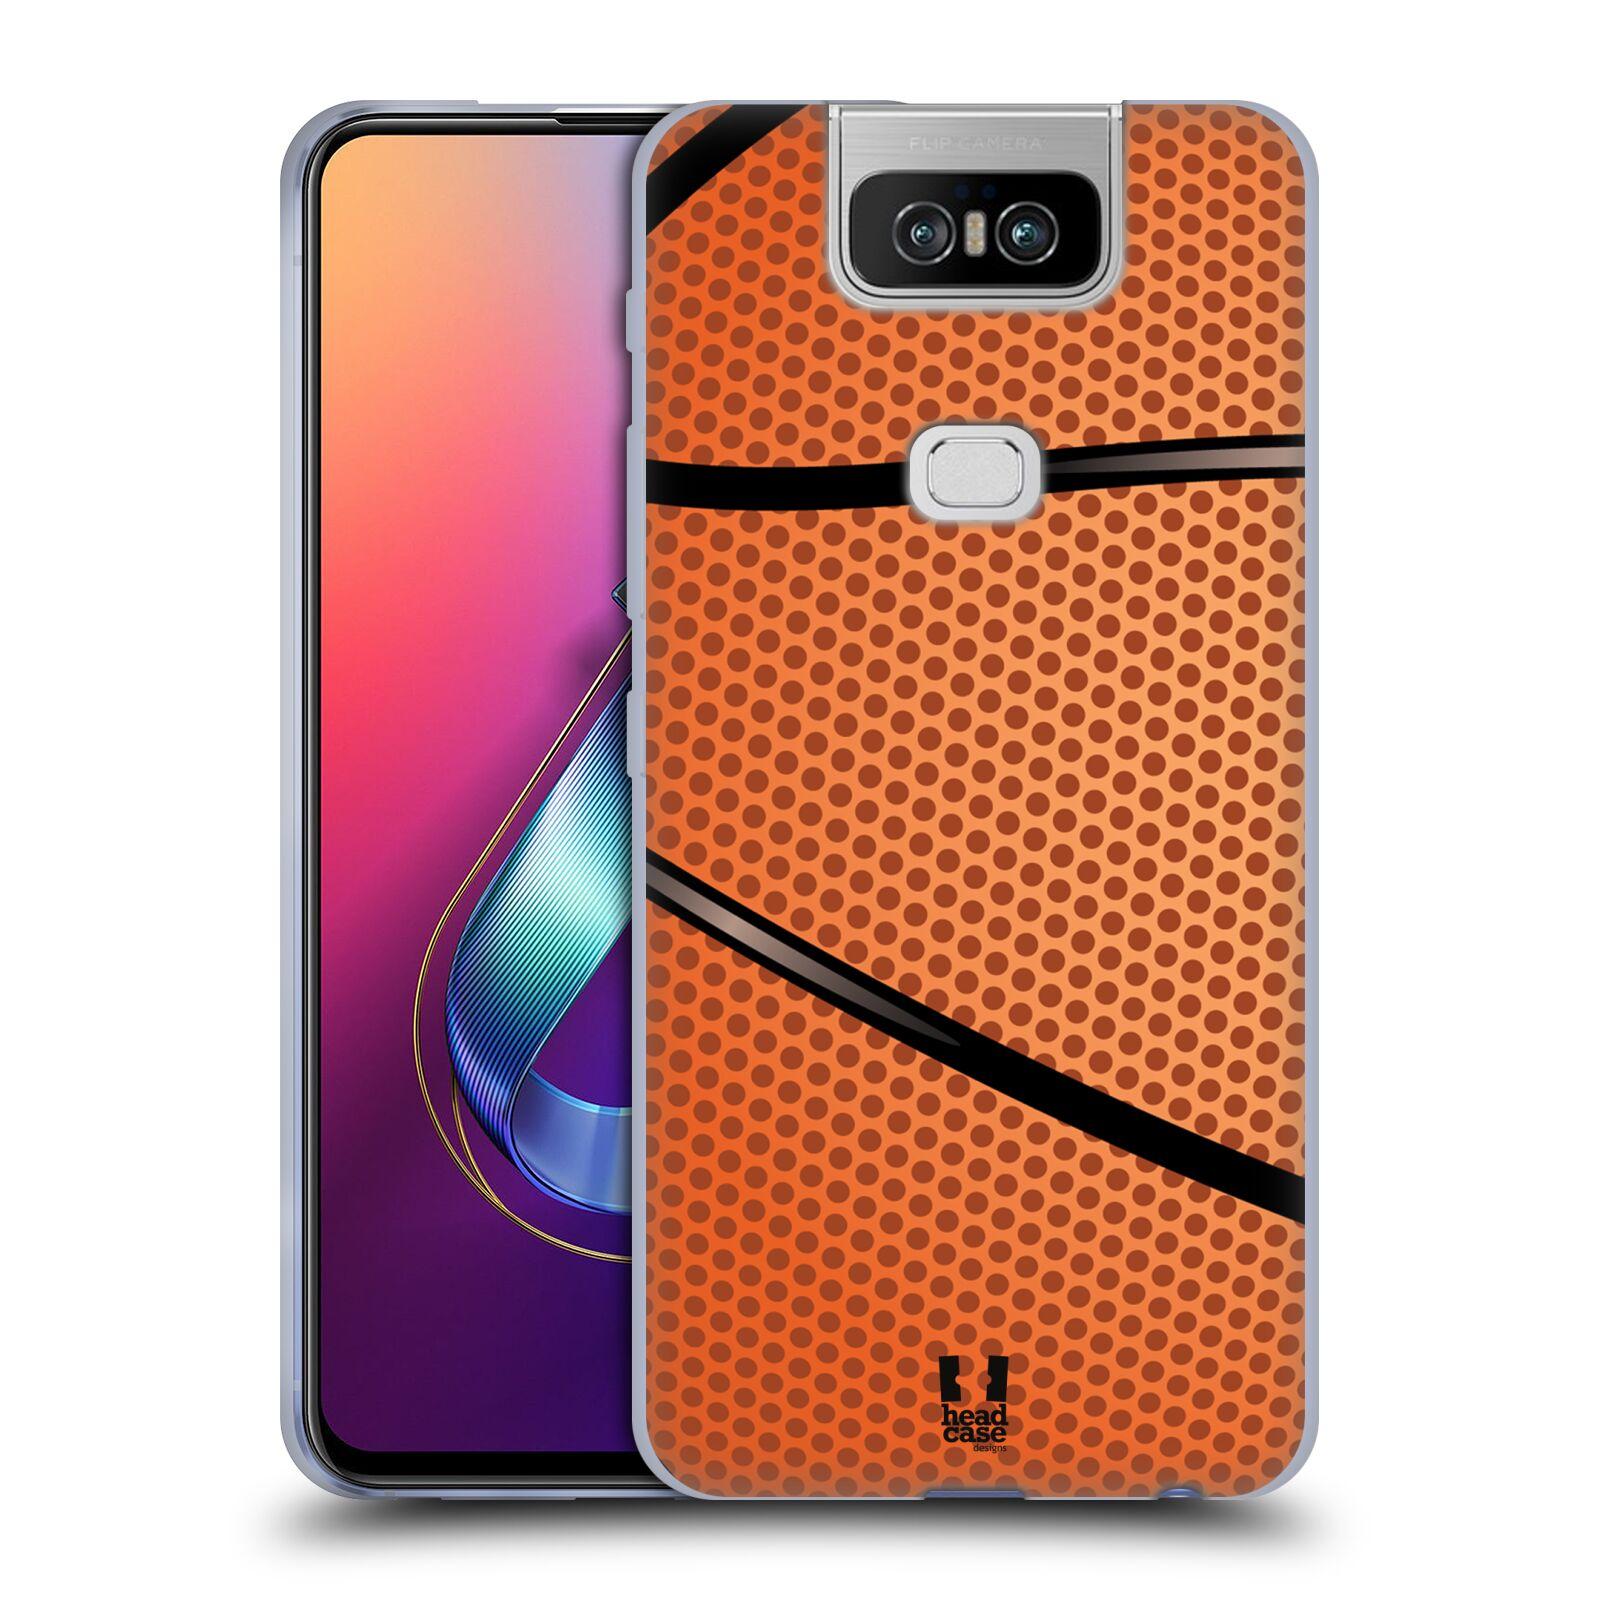 Silikonové pouzdro na mobil Asus Zenfone 6 ZS630KL - Head Case - BASKEŤÁK